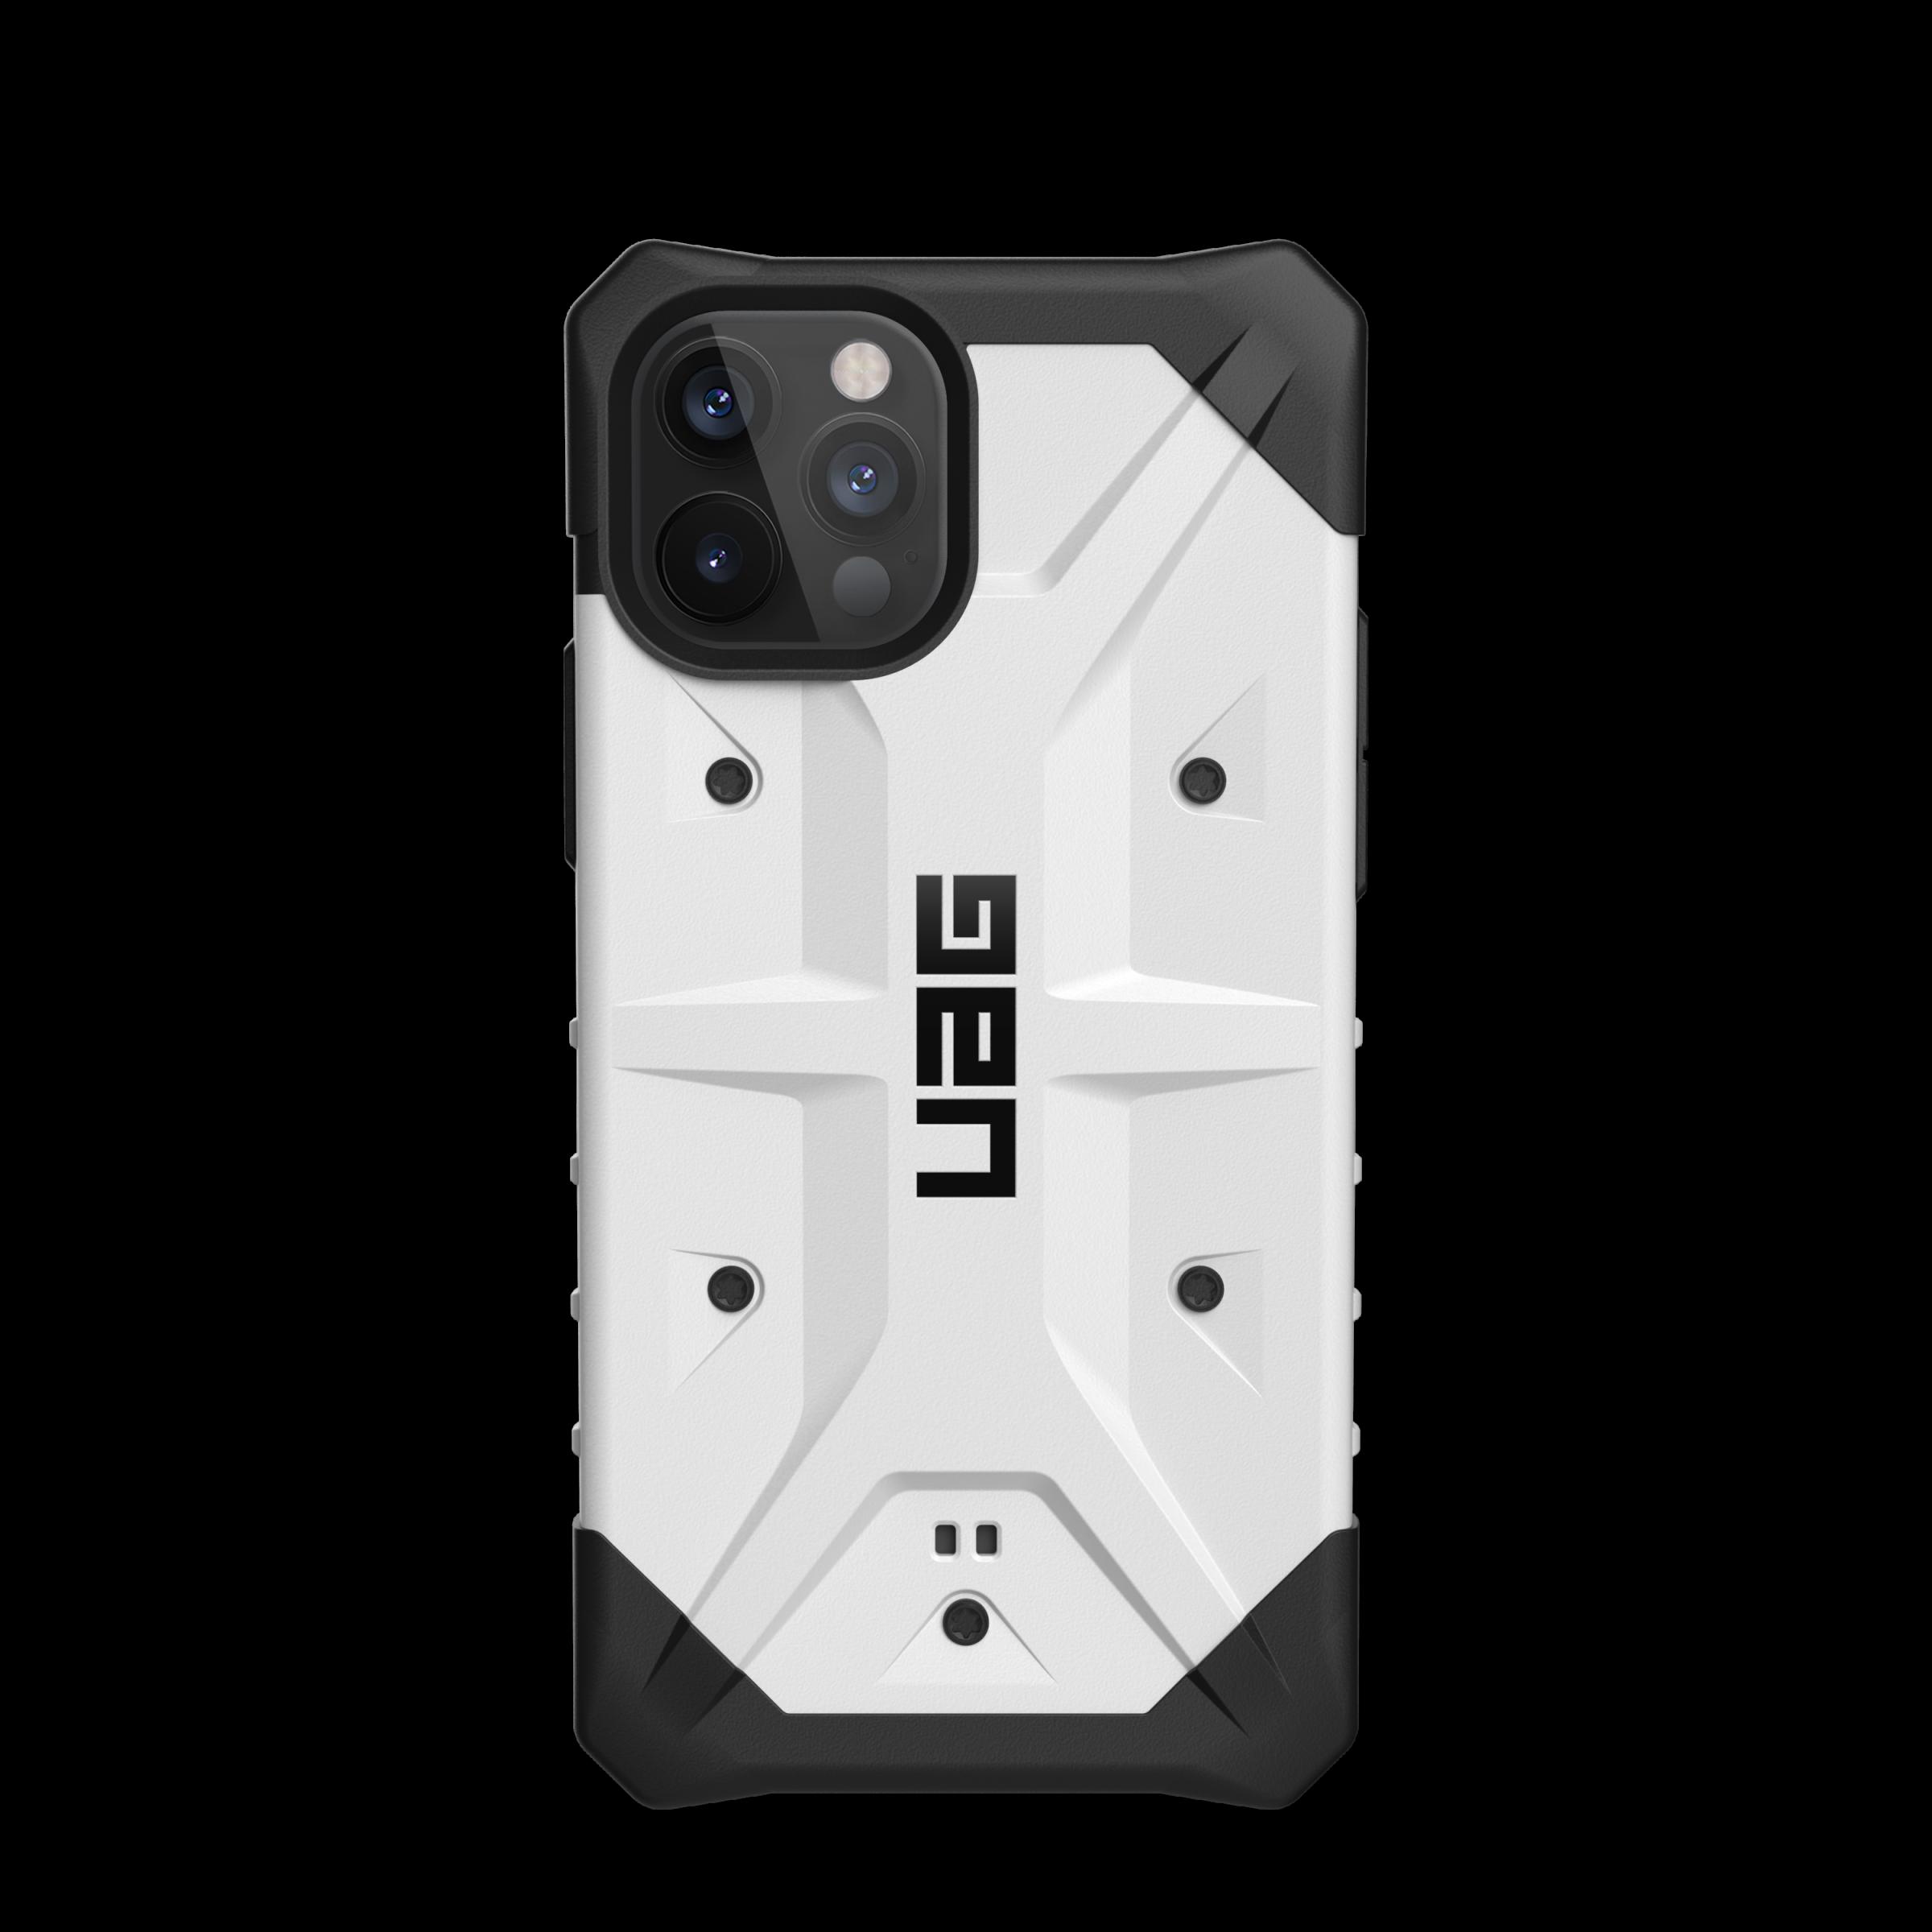 Pathfinder Series Case iPhone 12 Pro Max White